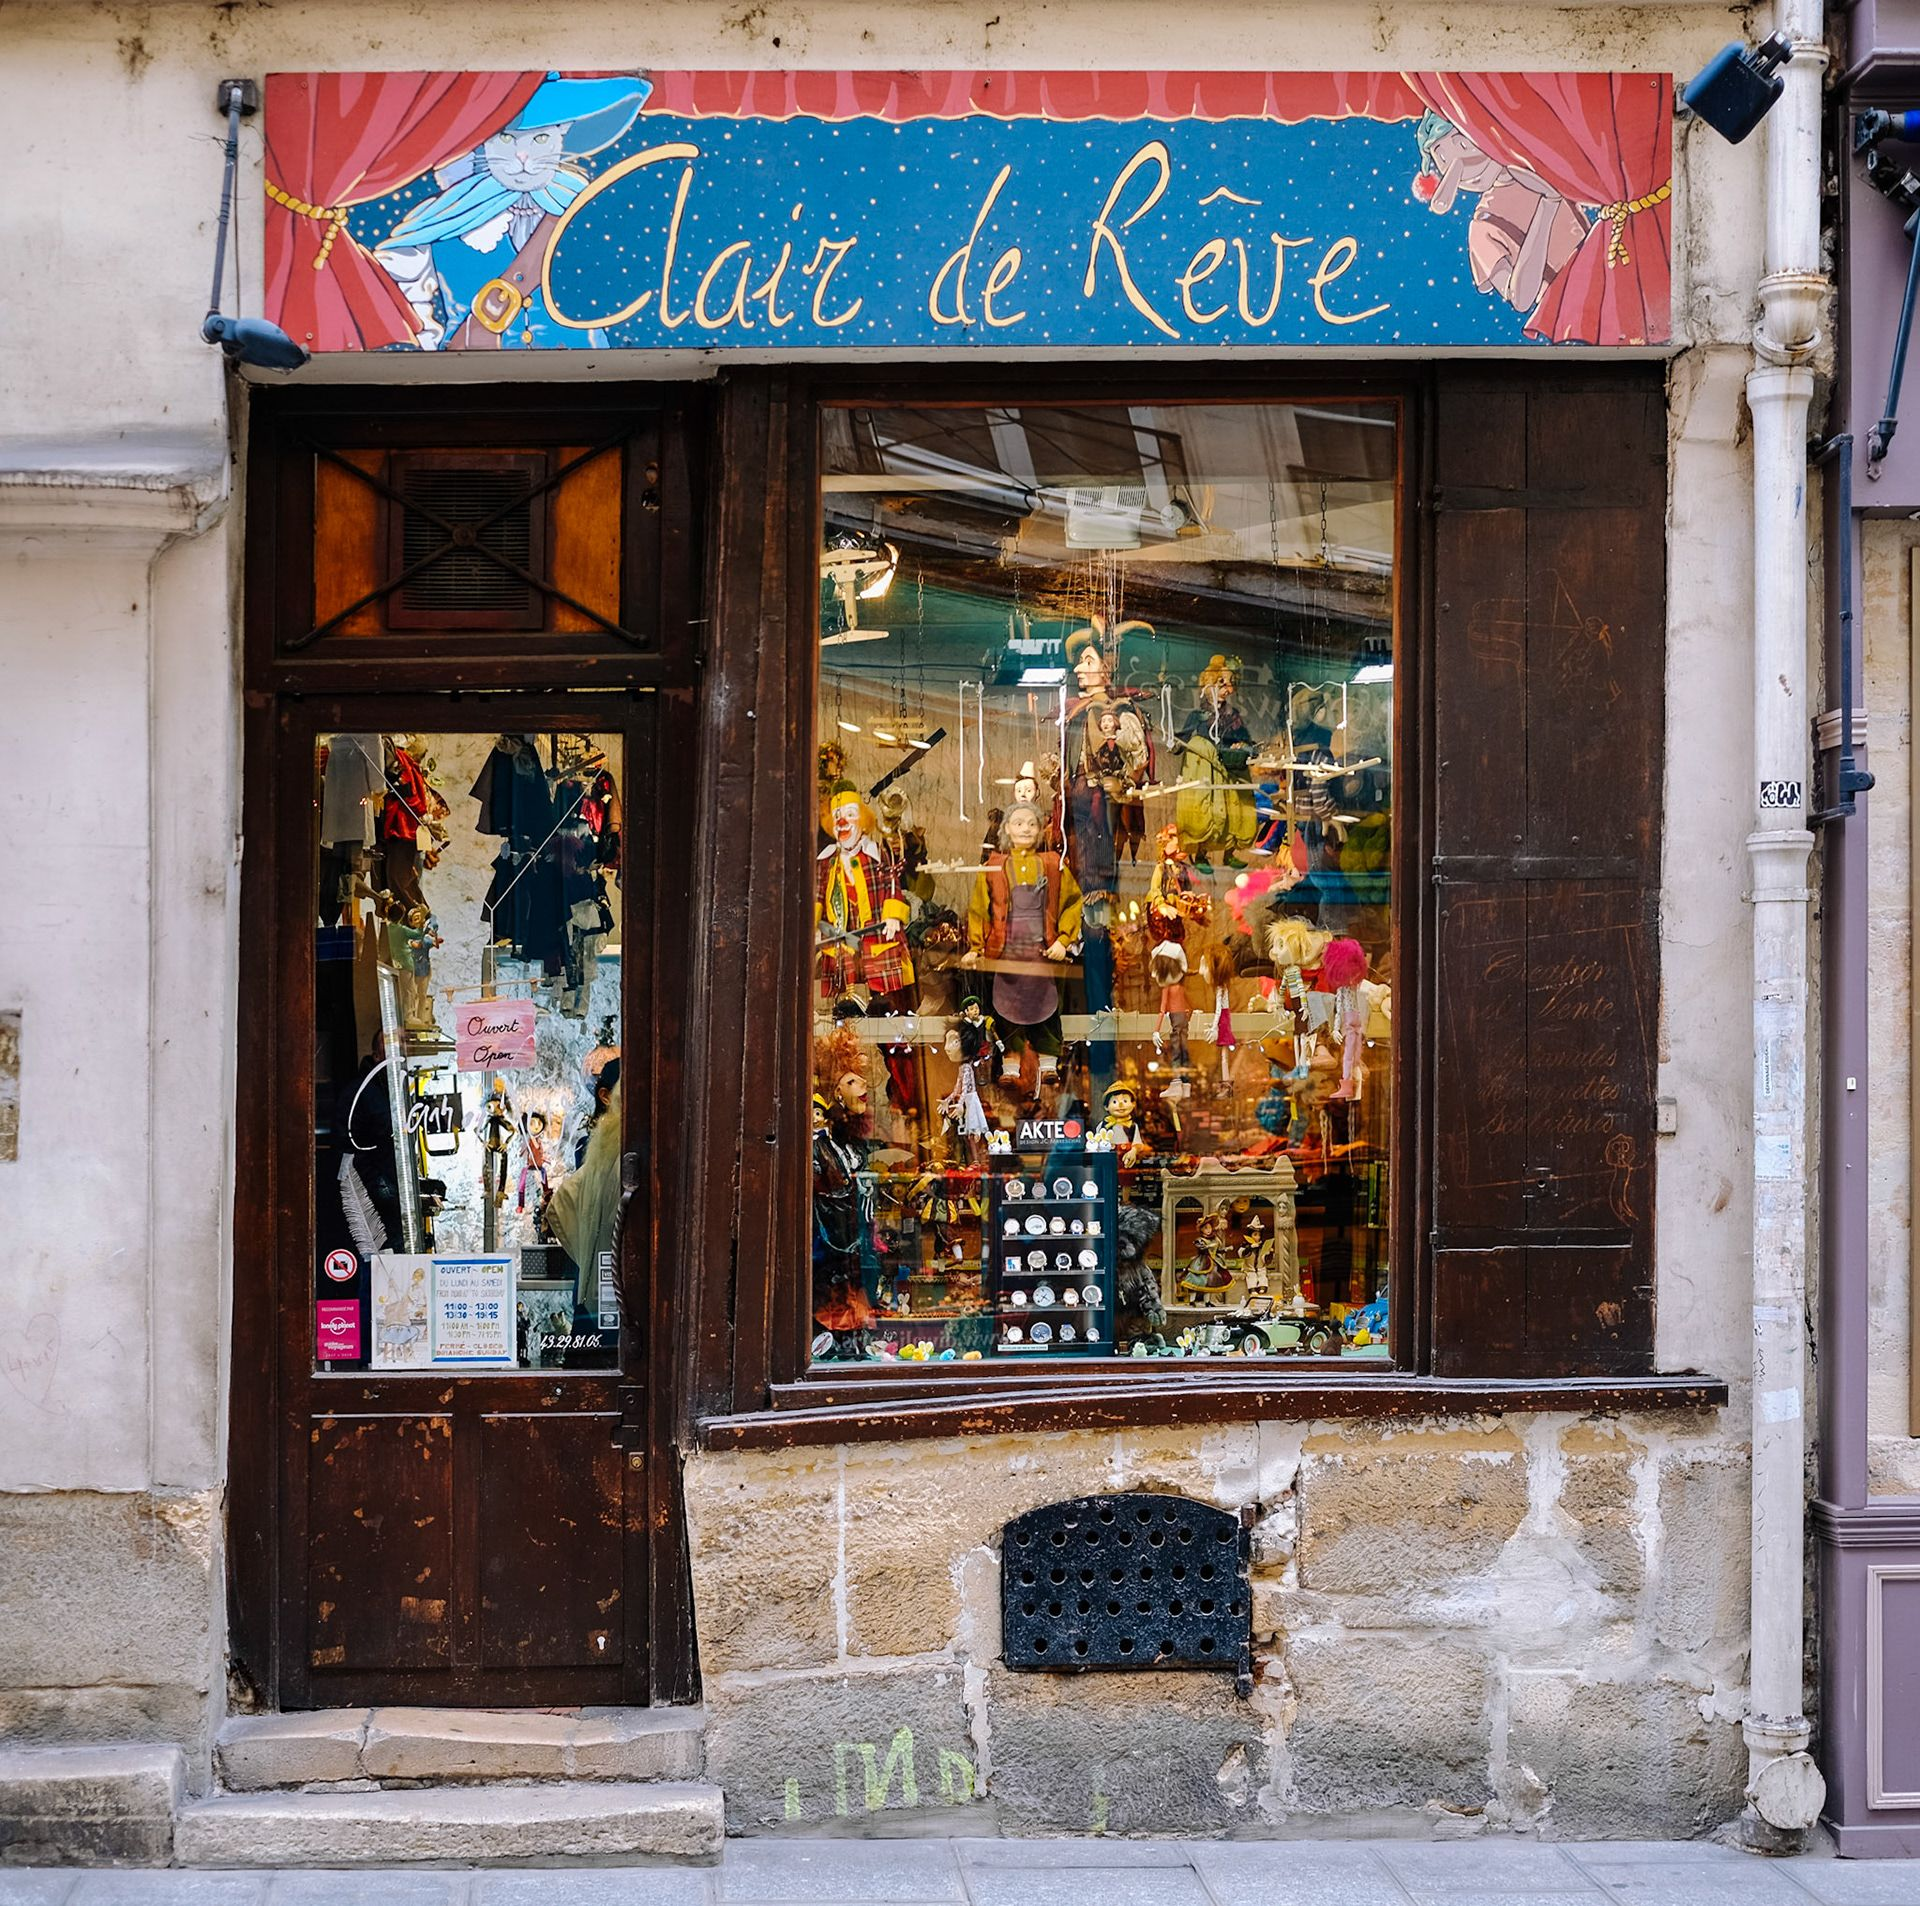 Clair de Reve storefront in Paris